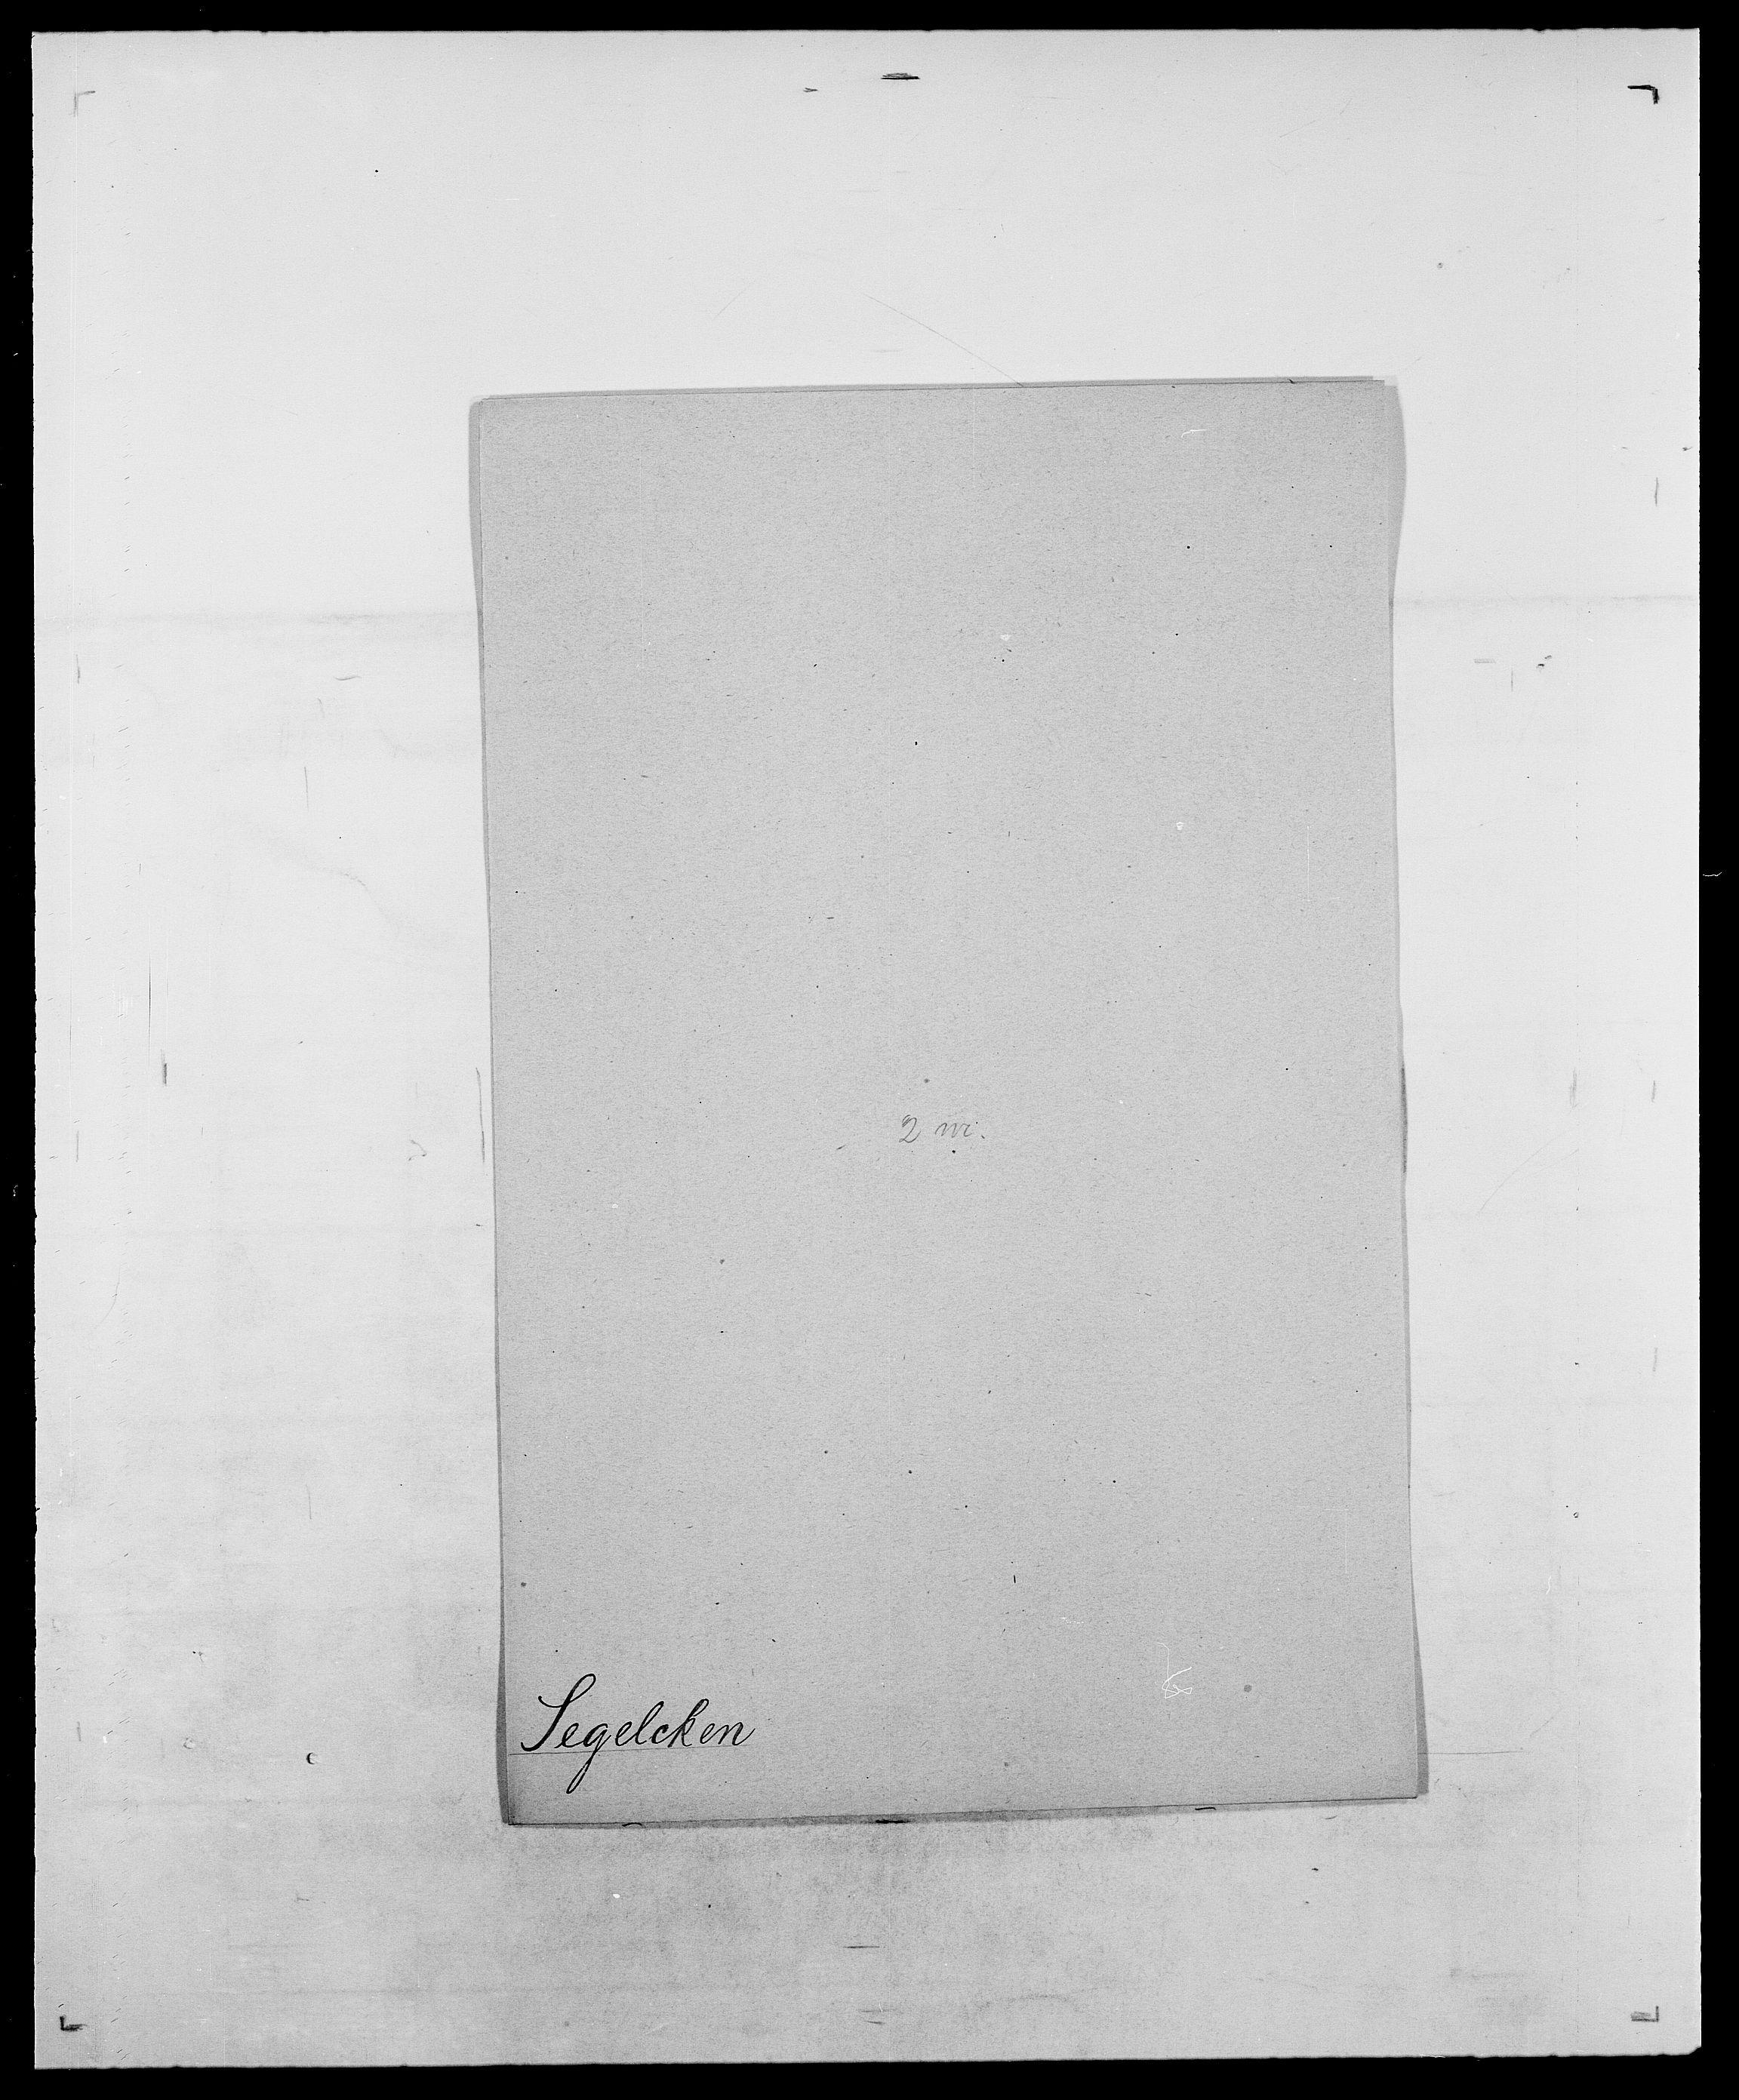 SAO, Delgobe, Charles Antoine - samling, D/Da/L0035: Schnabel - sjetman, s. 587